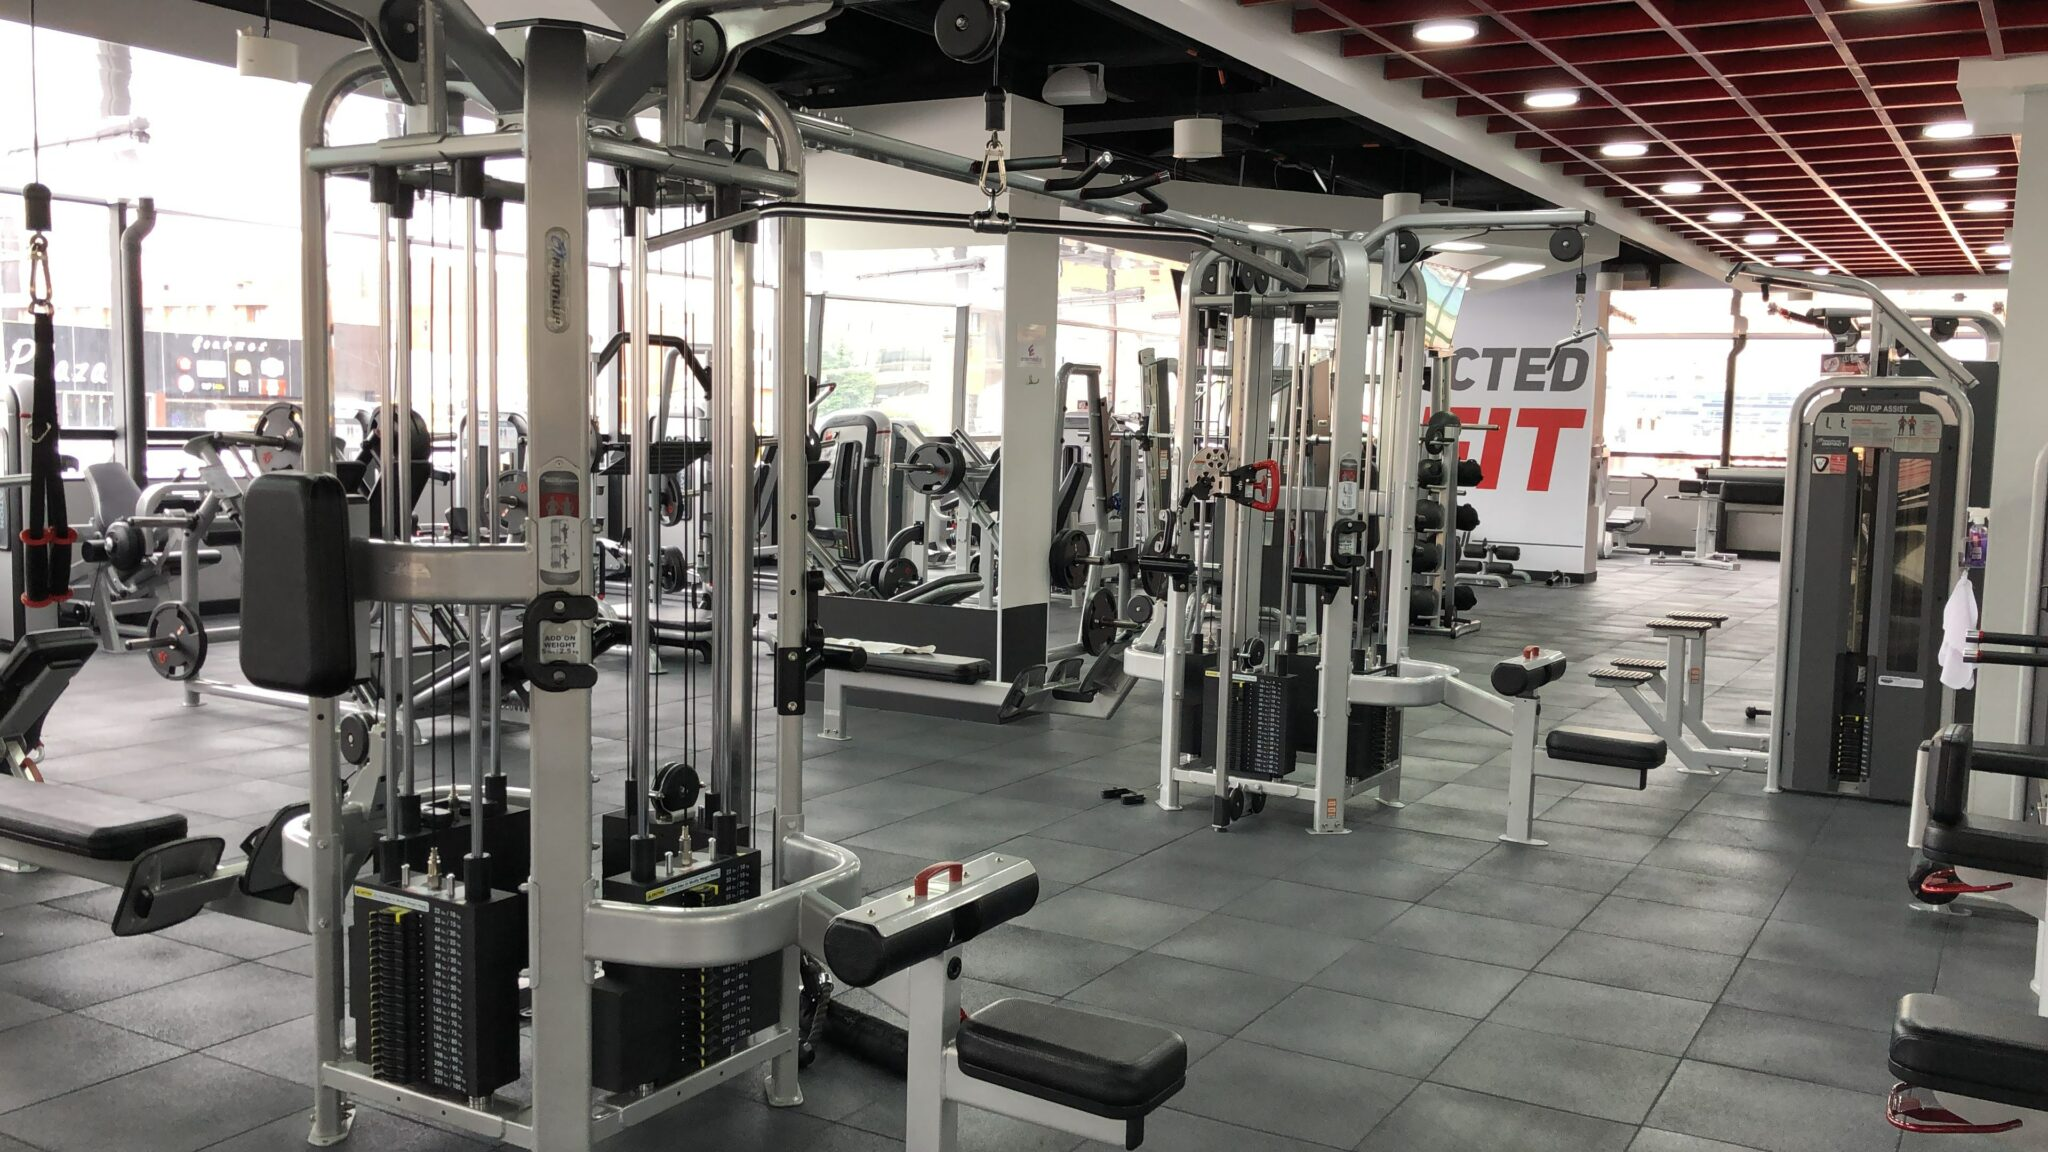 empty gyms